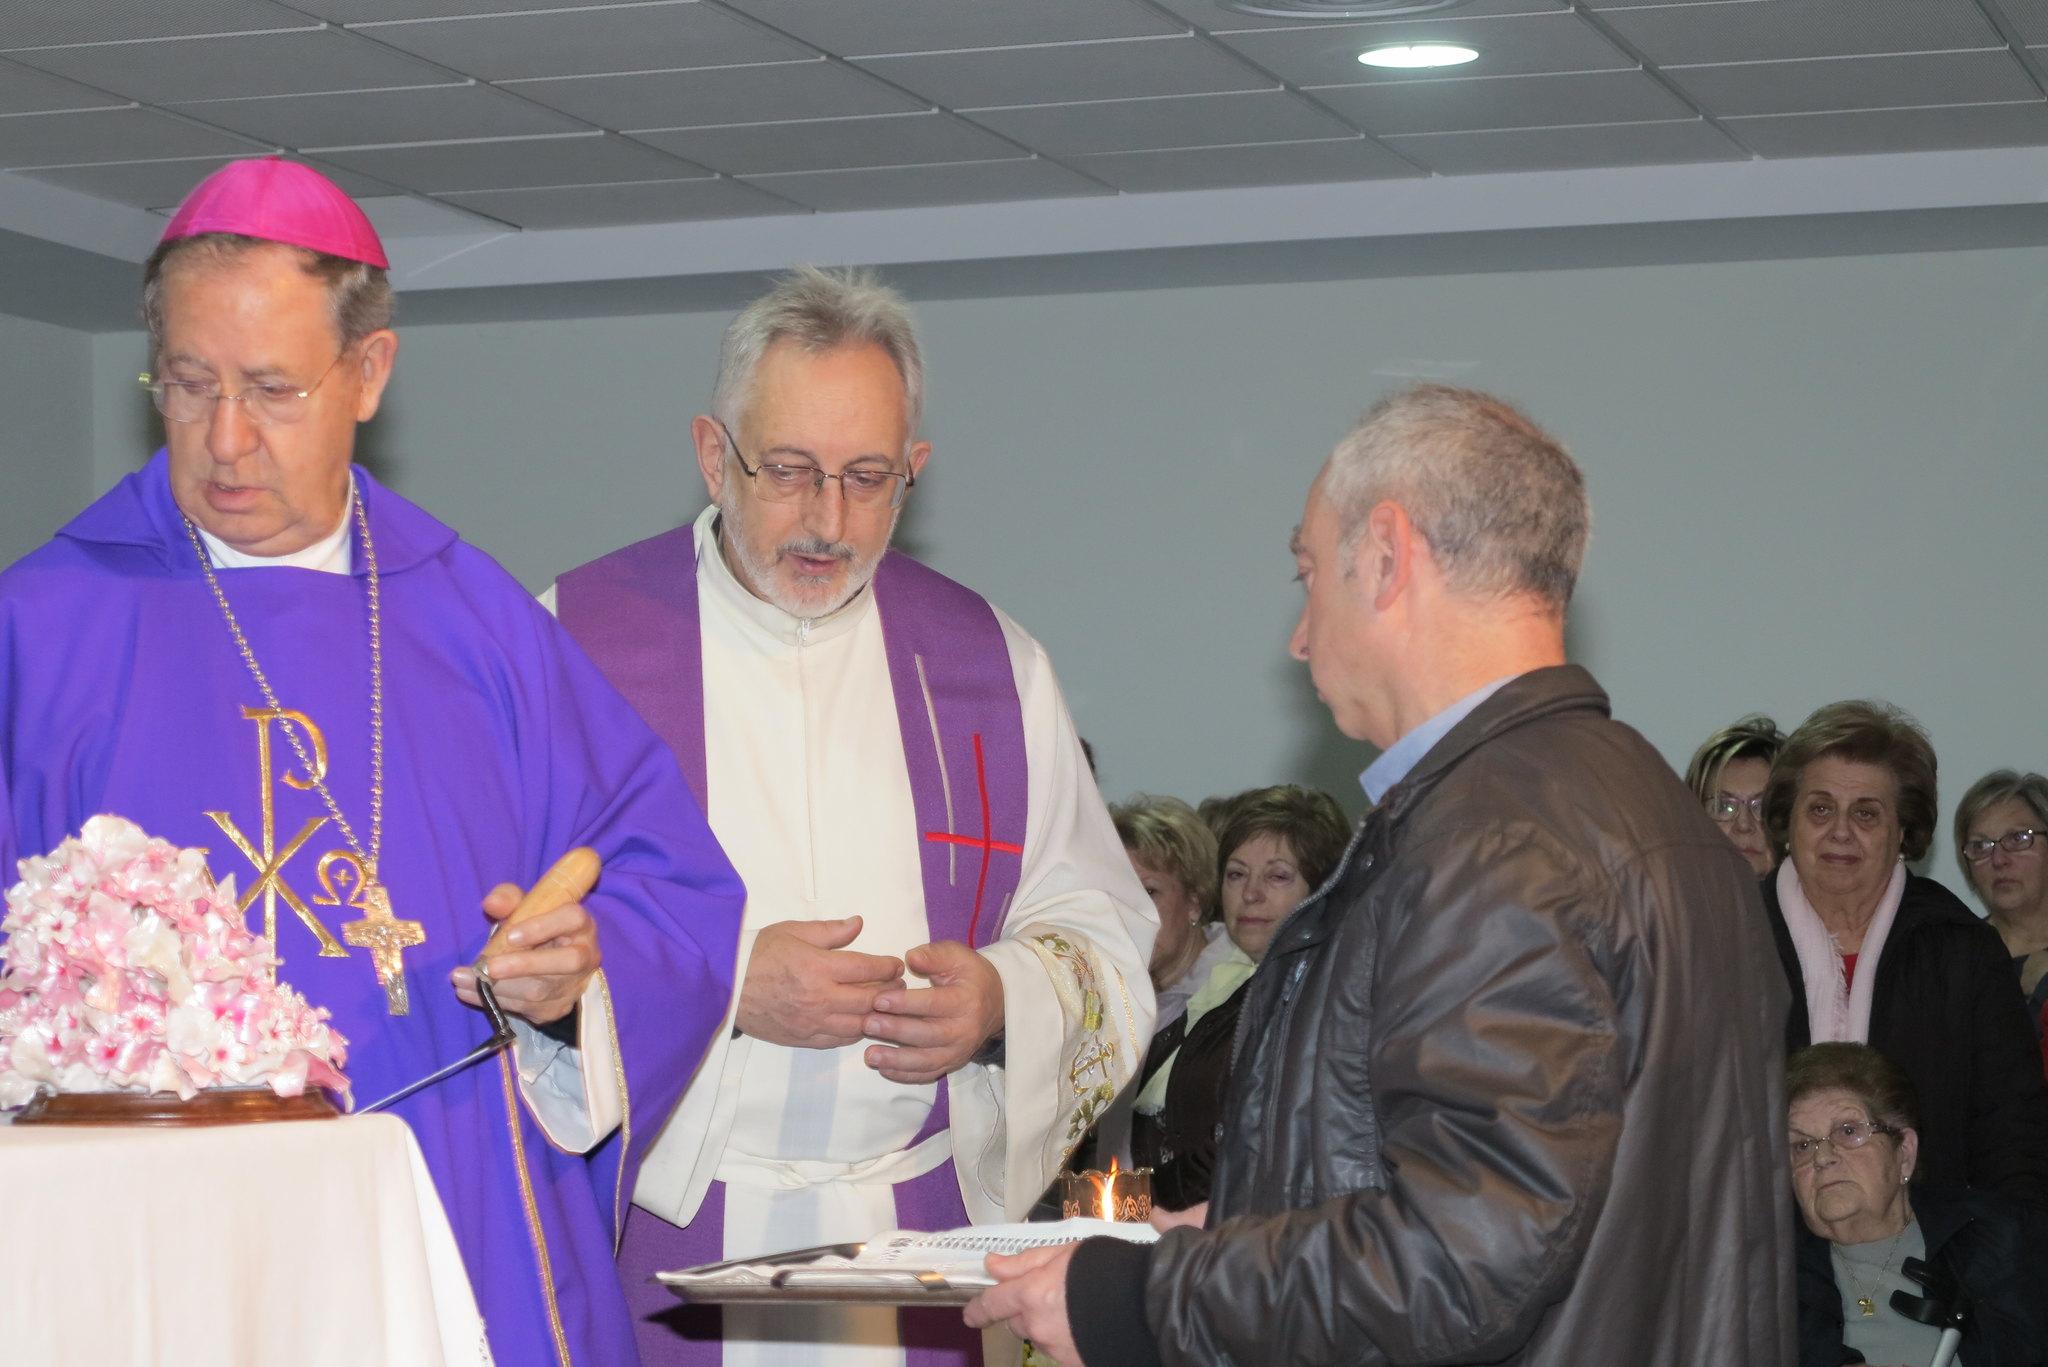 (2016-02-13) - Inauguración Virgen de Lourdes, La Molineta - Archivo La Molineta 2 (24)